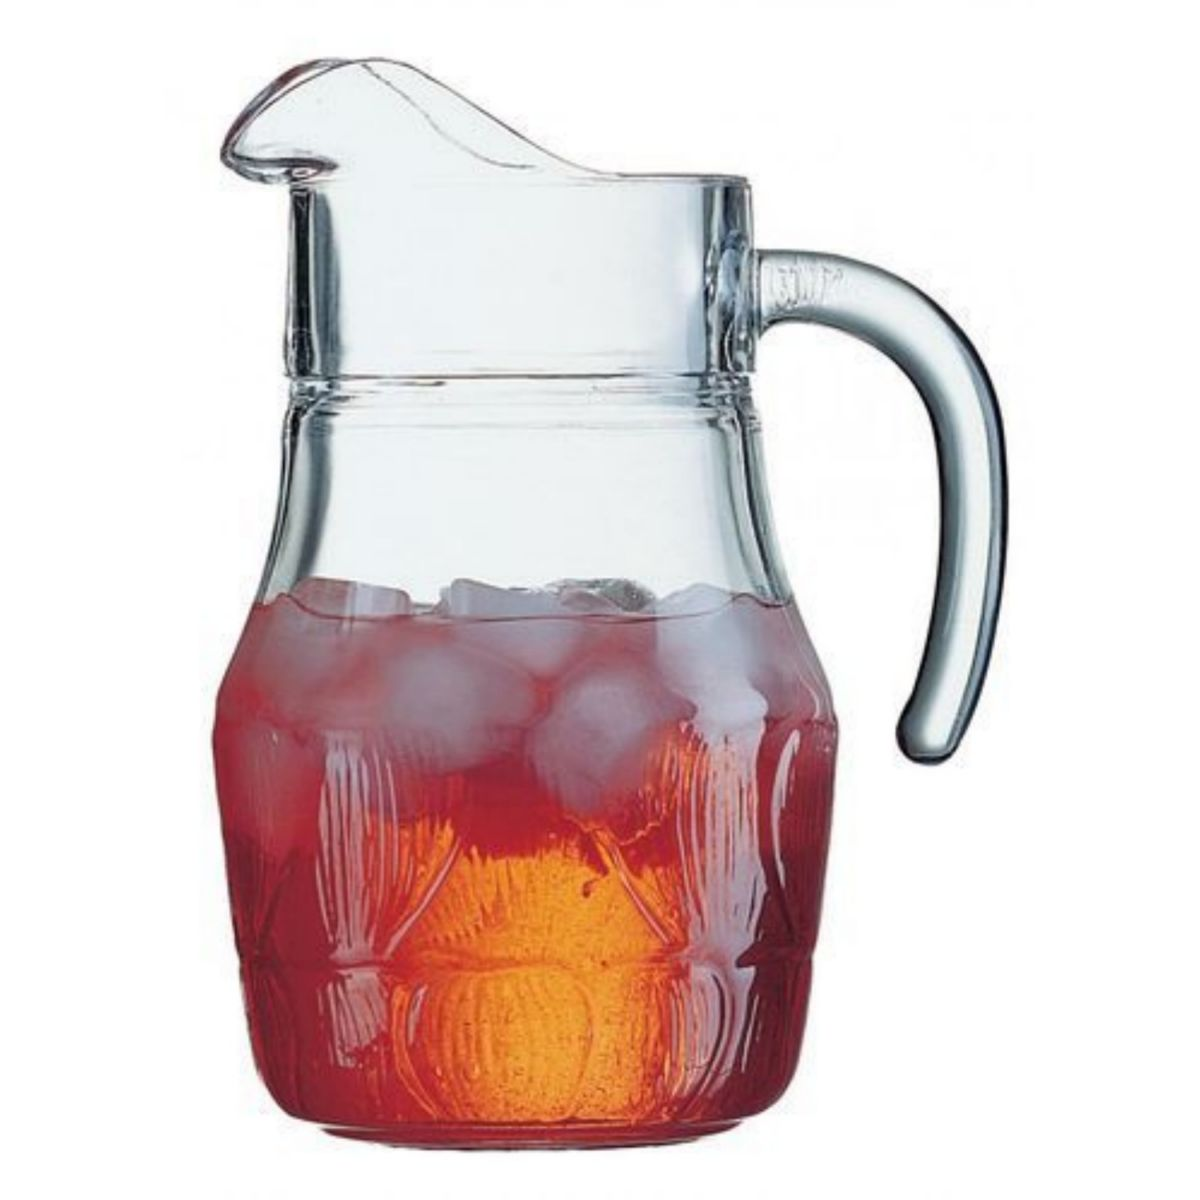 FLEUR džbán 1,3 l s brzdou na led